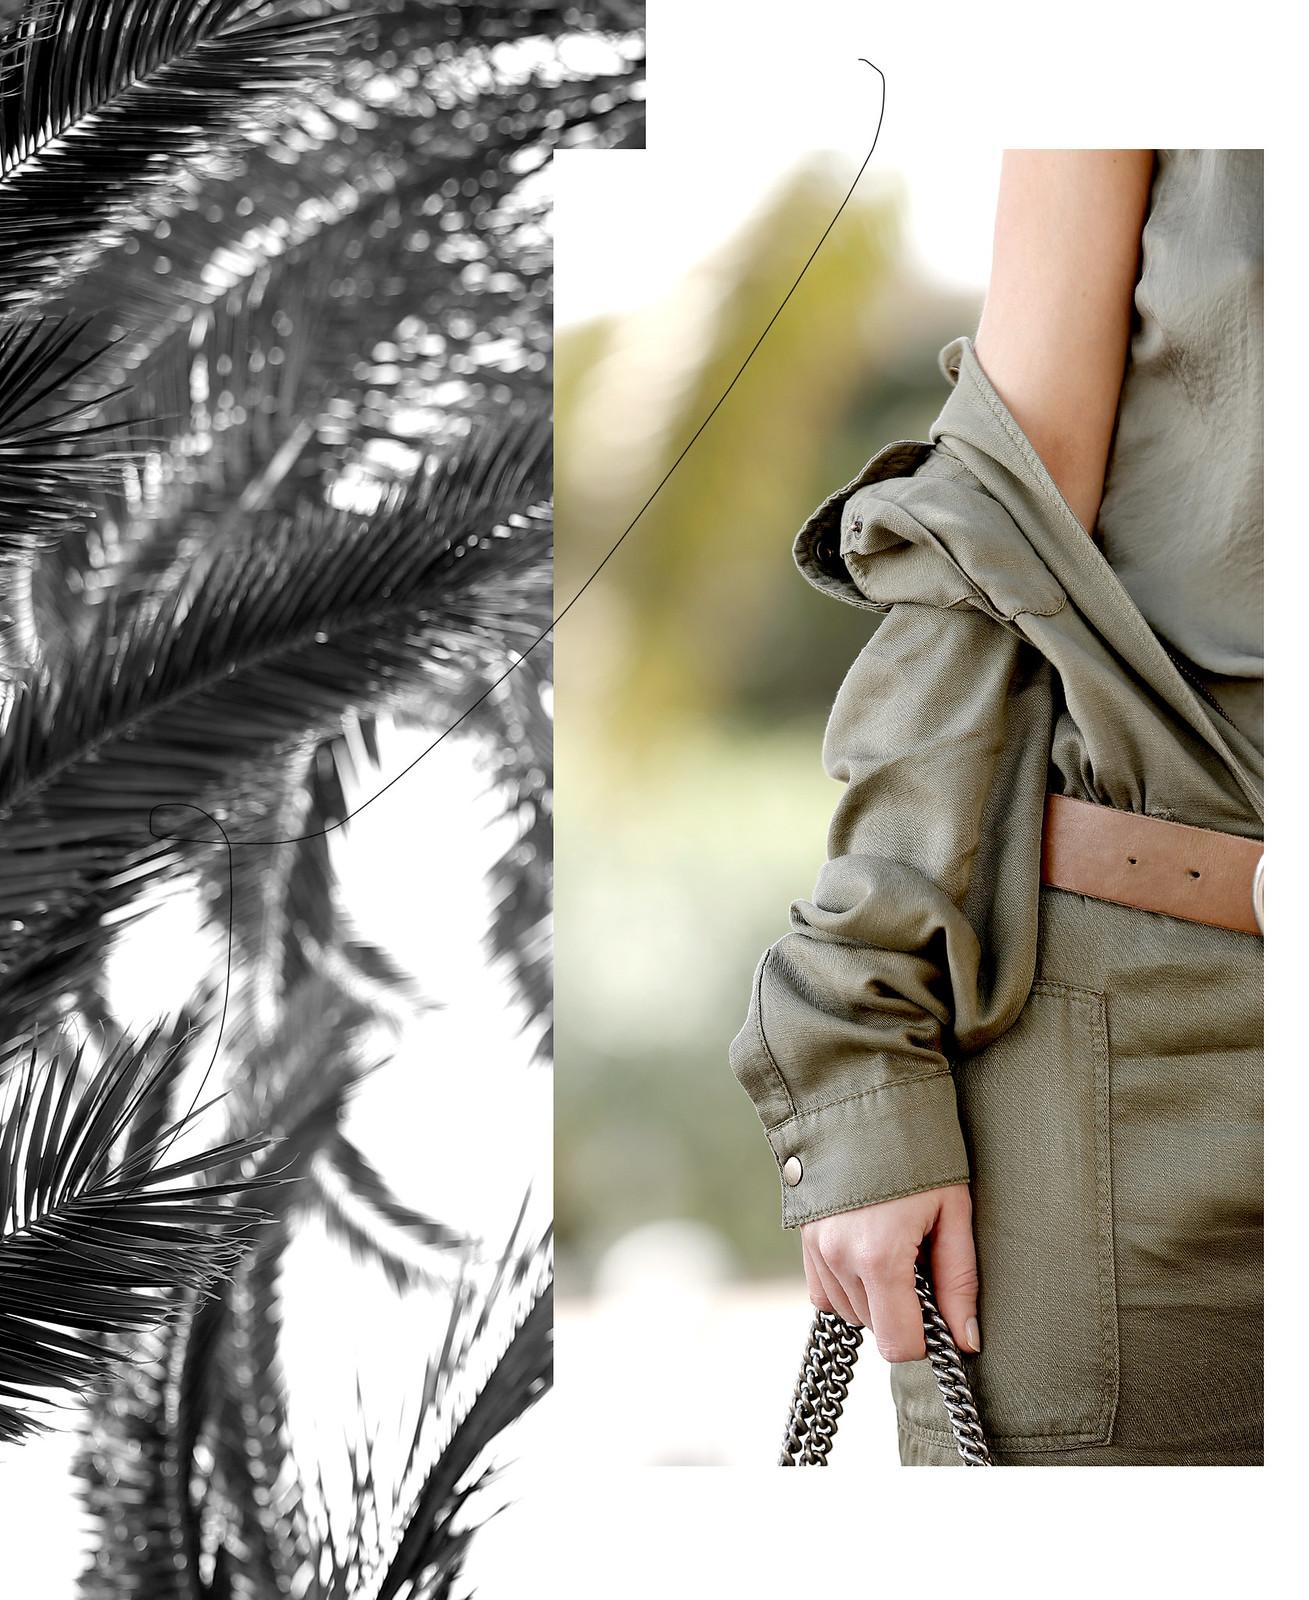 promod african safari jumpsuit khaki outfit ootd blogger modeblogger gucci dionysus céline audrey summer palms travelblogger cats & dogs ricarda schernus düsseldorf blog 3